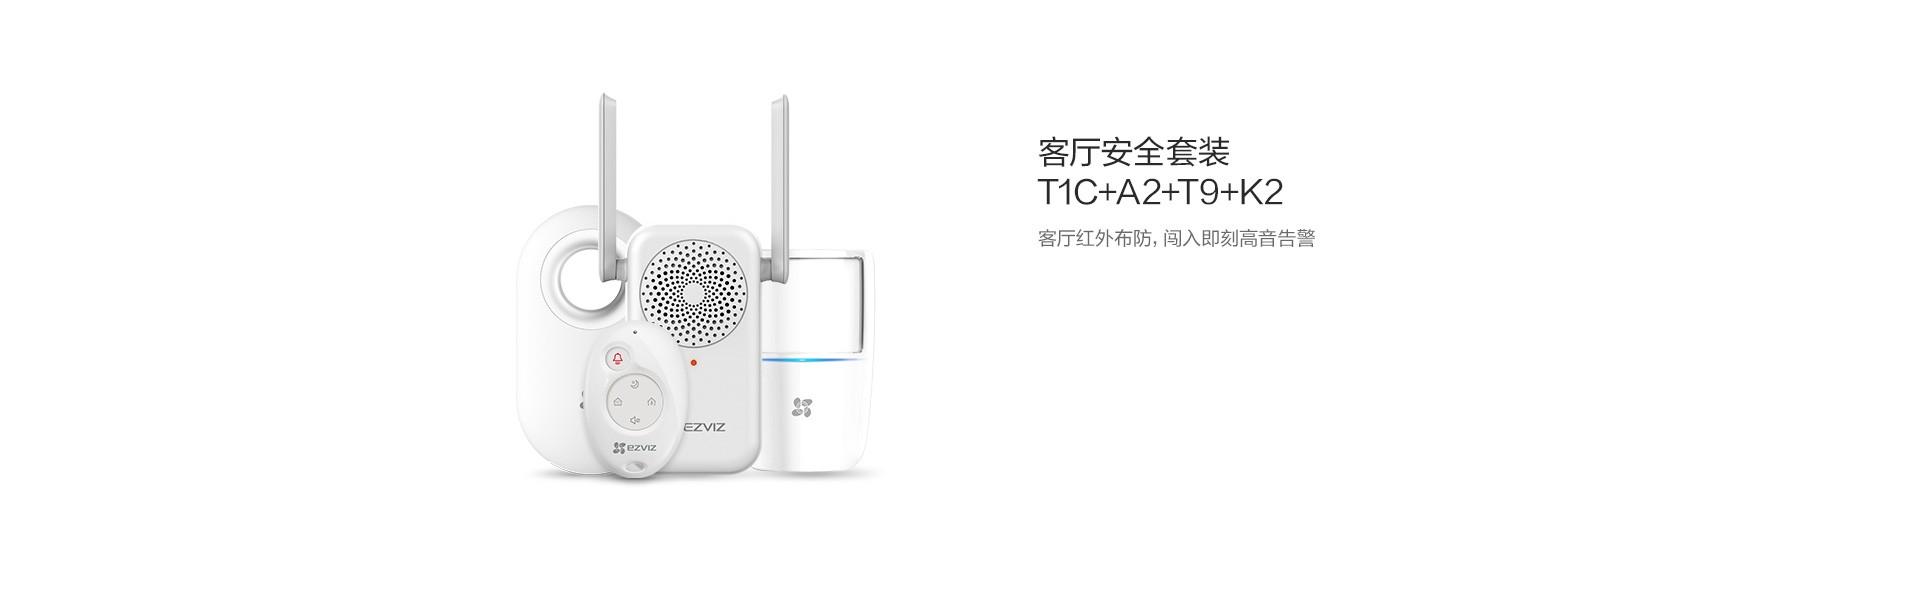 T1C+A2+T9+K2-2.jpg